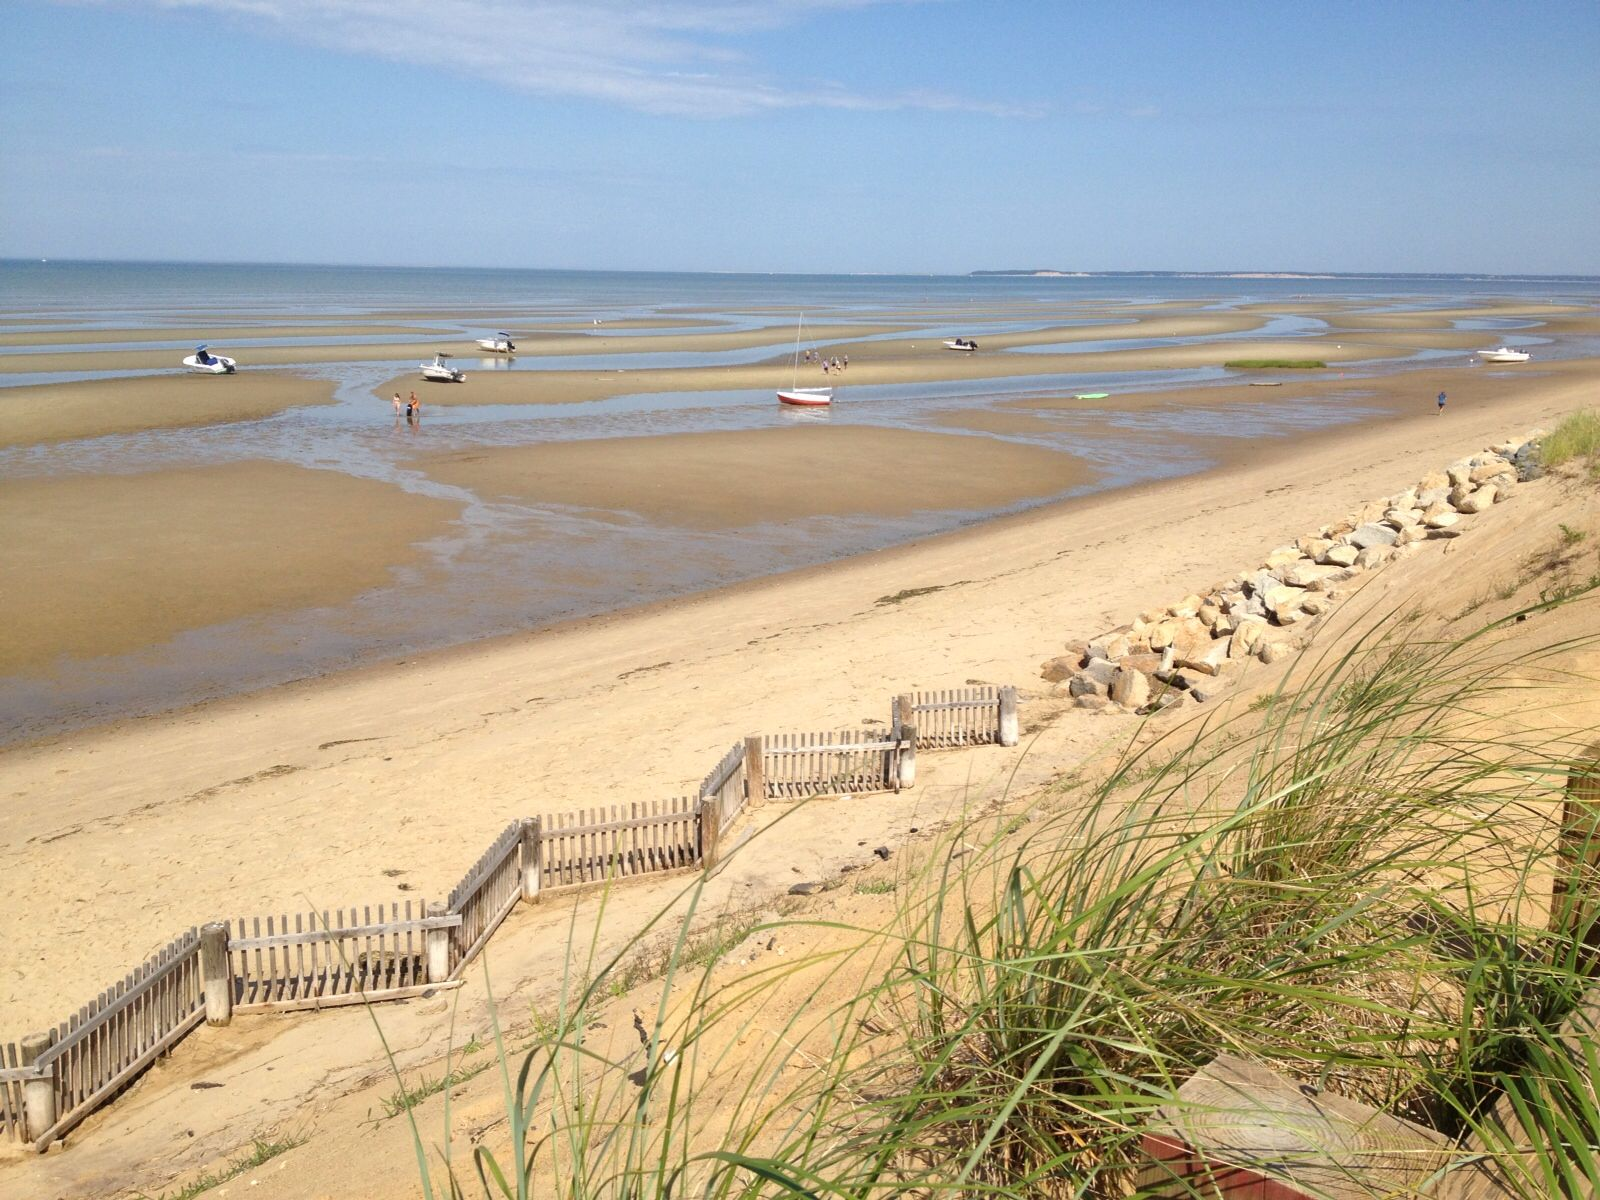 Nice Cape Cod Low Tide Part - 13: Explore Cape Cod Beaches, Footprints, And More! Low Tide ...